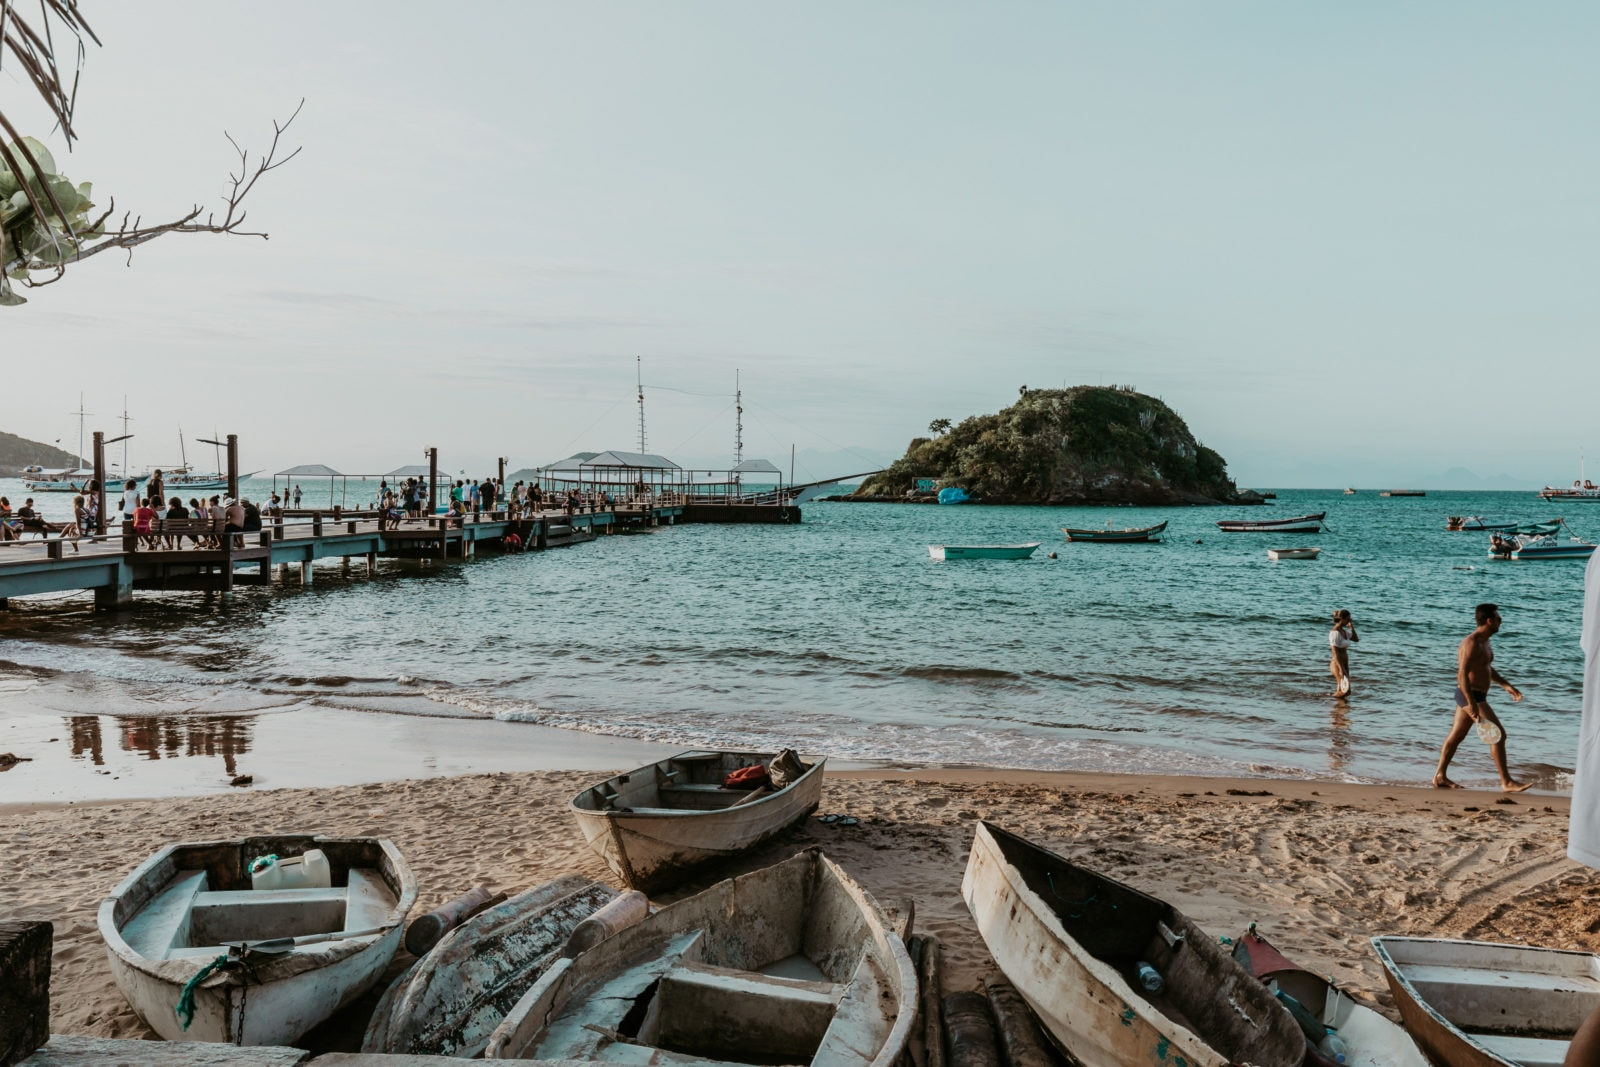 Buzios Fischerboote an der Promenade von Armação dos Buzíos in Brasilien